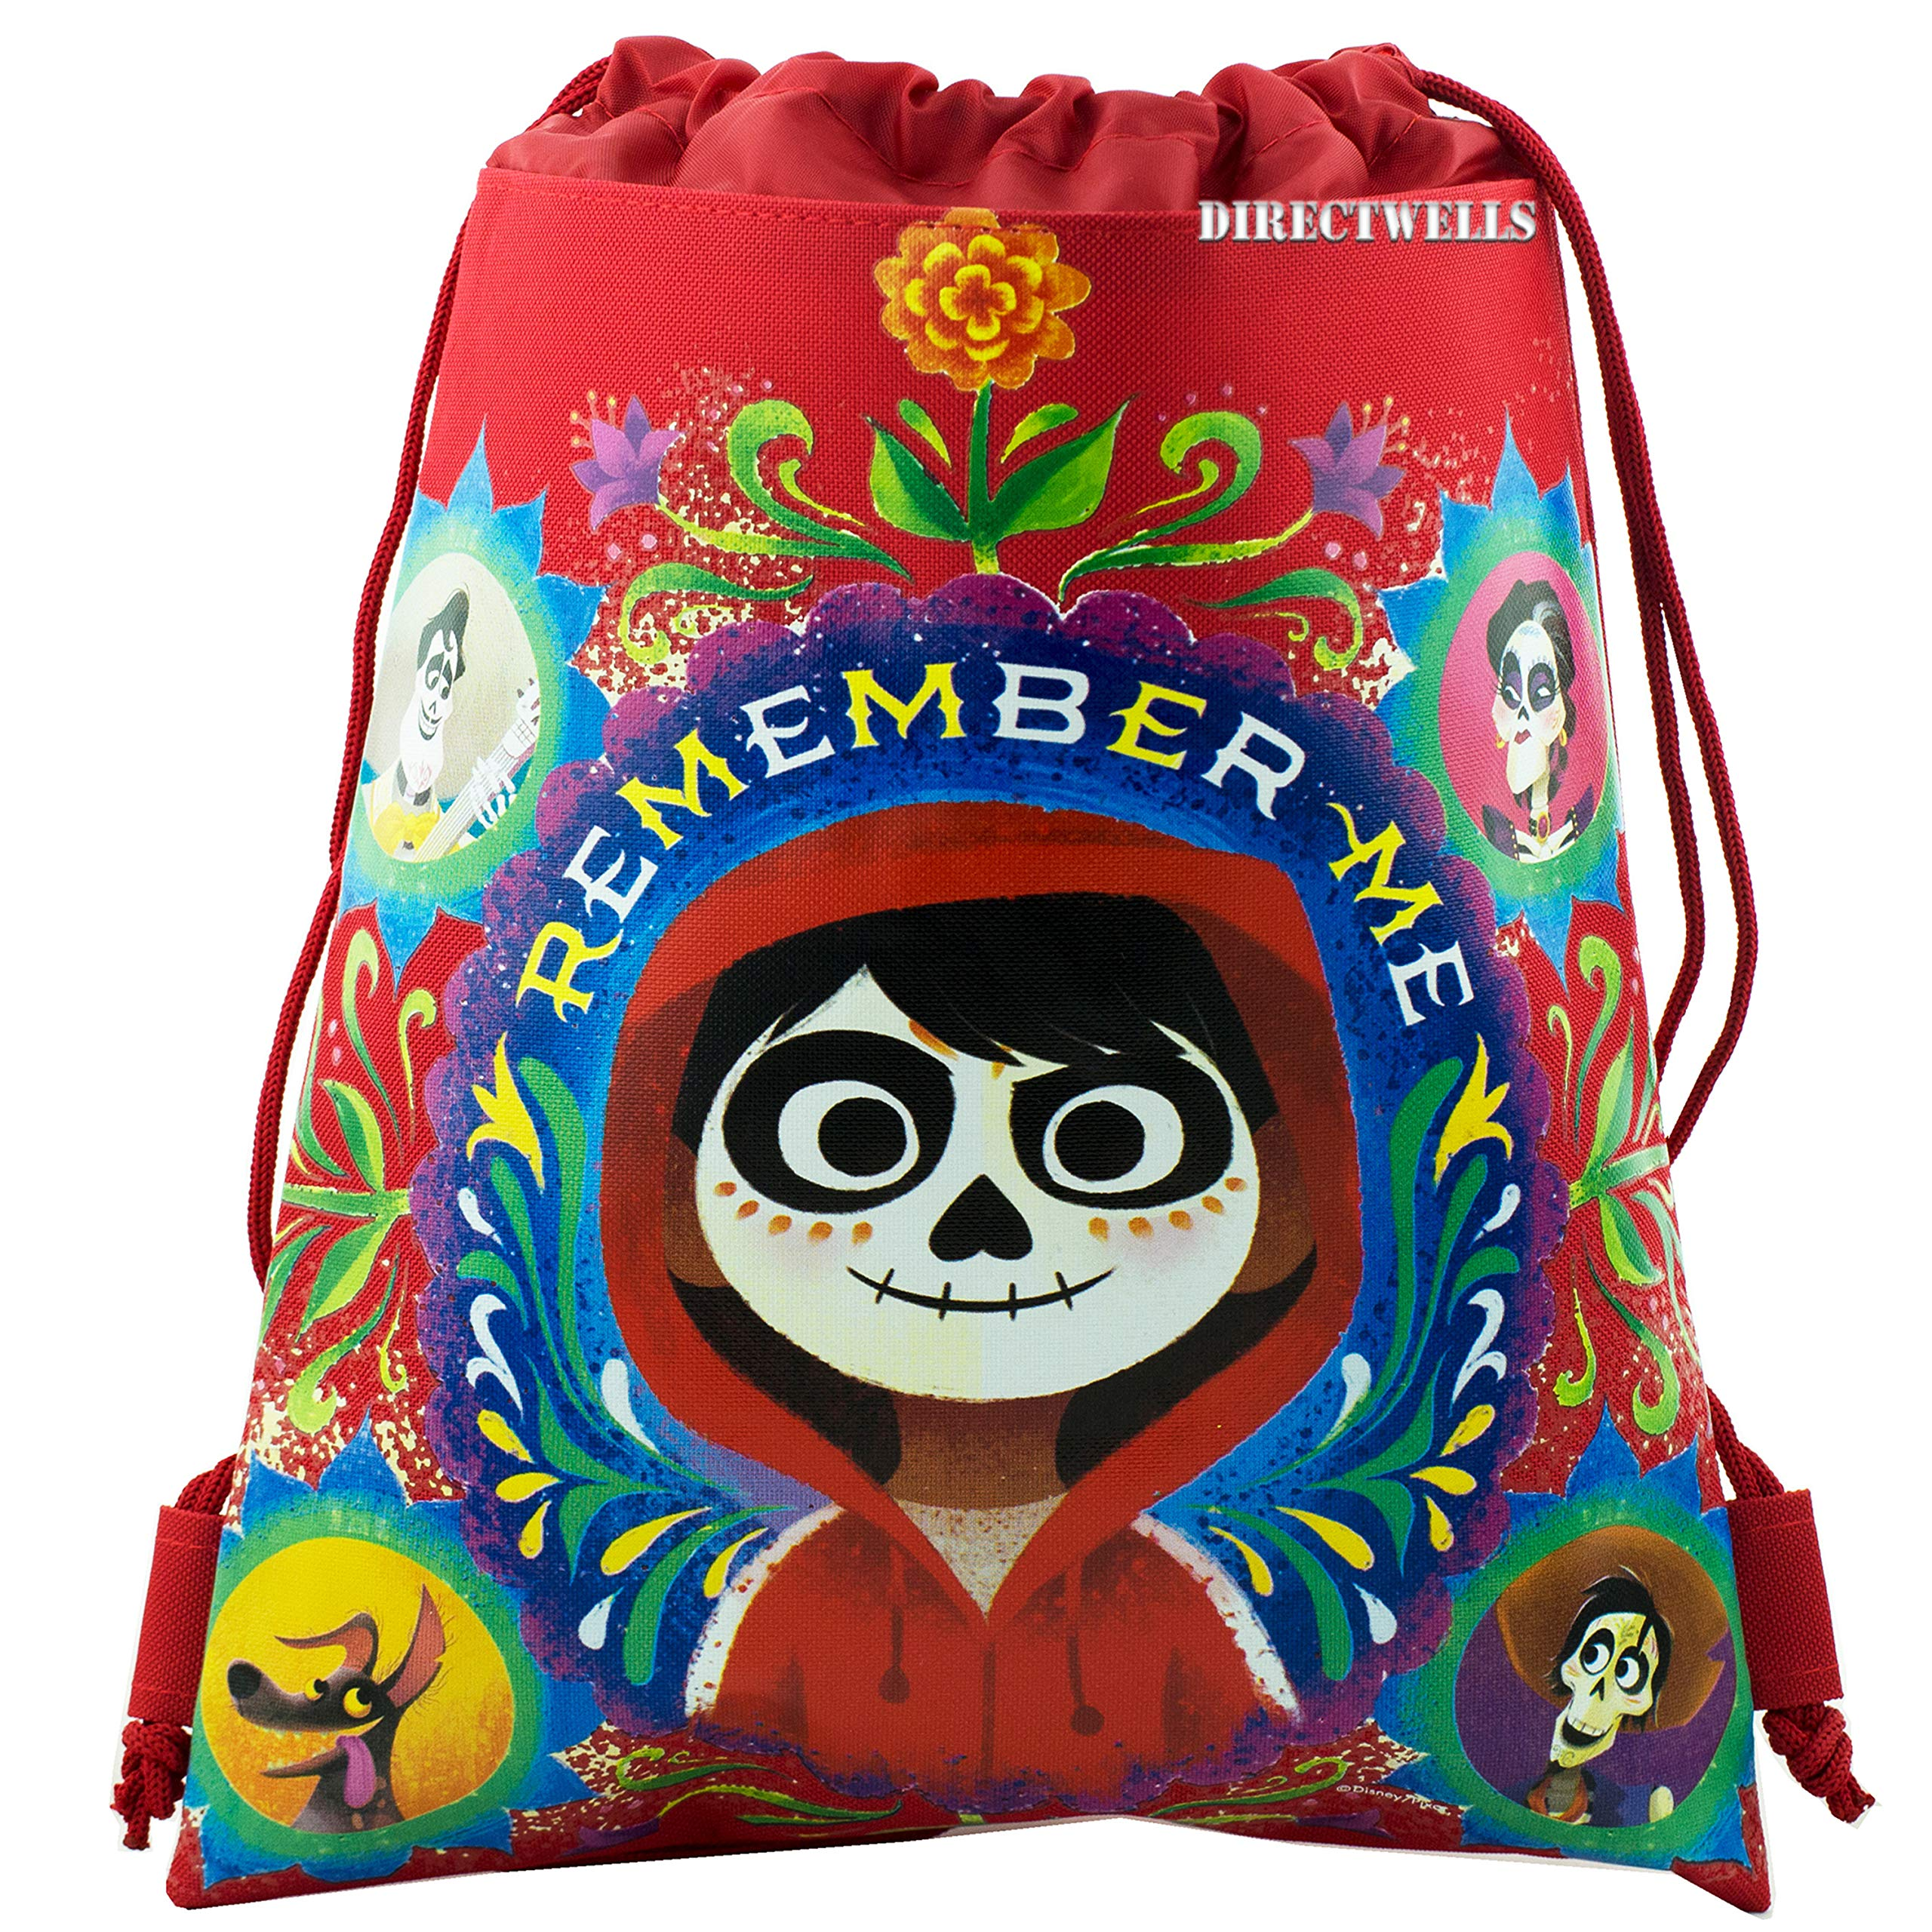 fca53c439f2 Amazon.com  Disney COCO Drawstring Backpack PIXAR Sling Tote Gym Bag (Pink  Miguel)  Kitchen   Dining